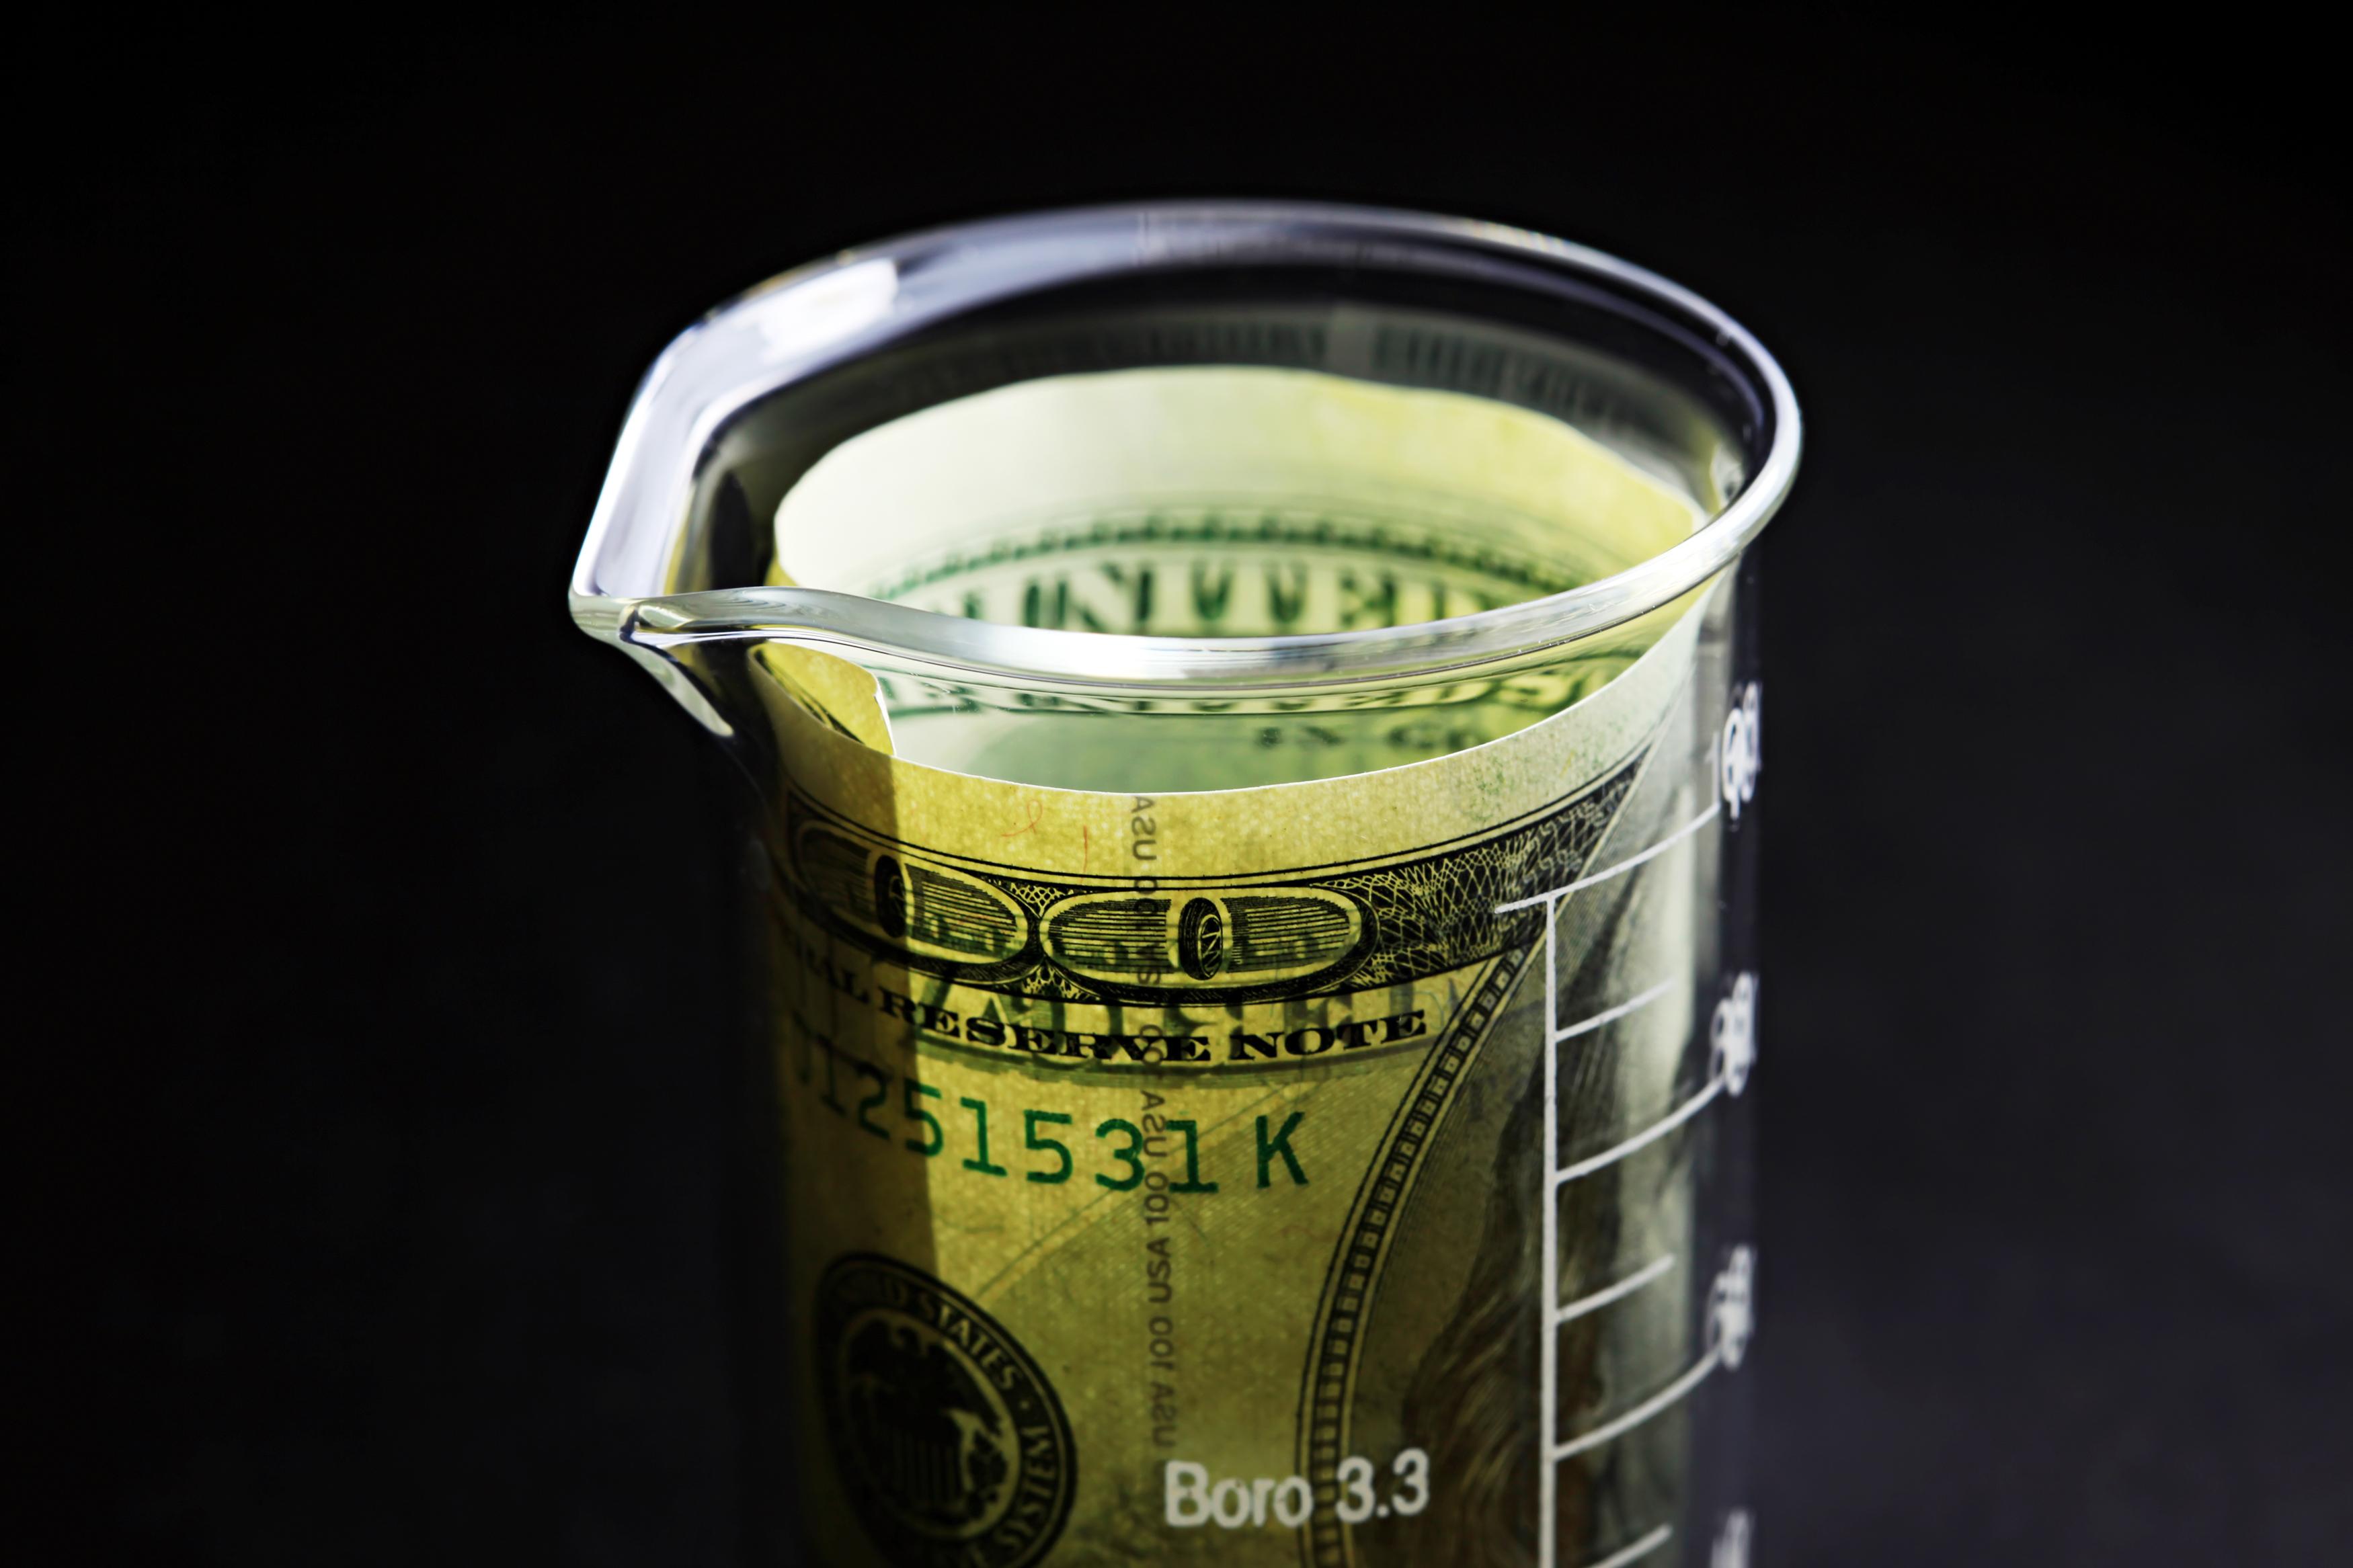 Hundred dollar bill rolled up in a beaker.